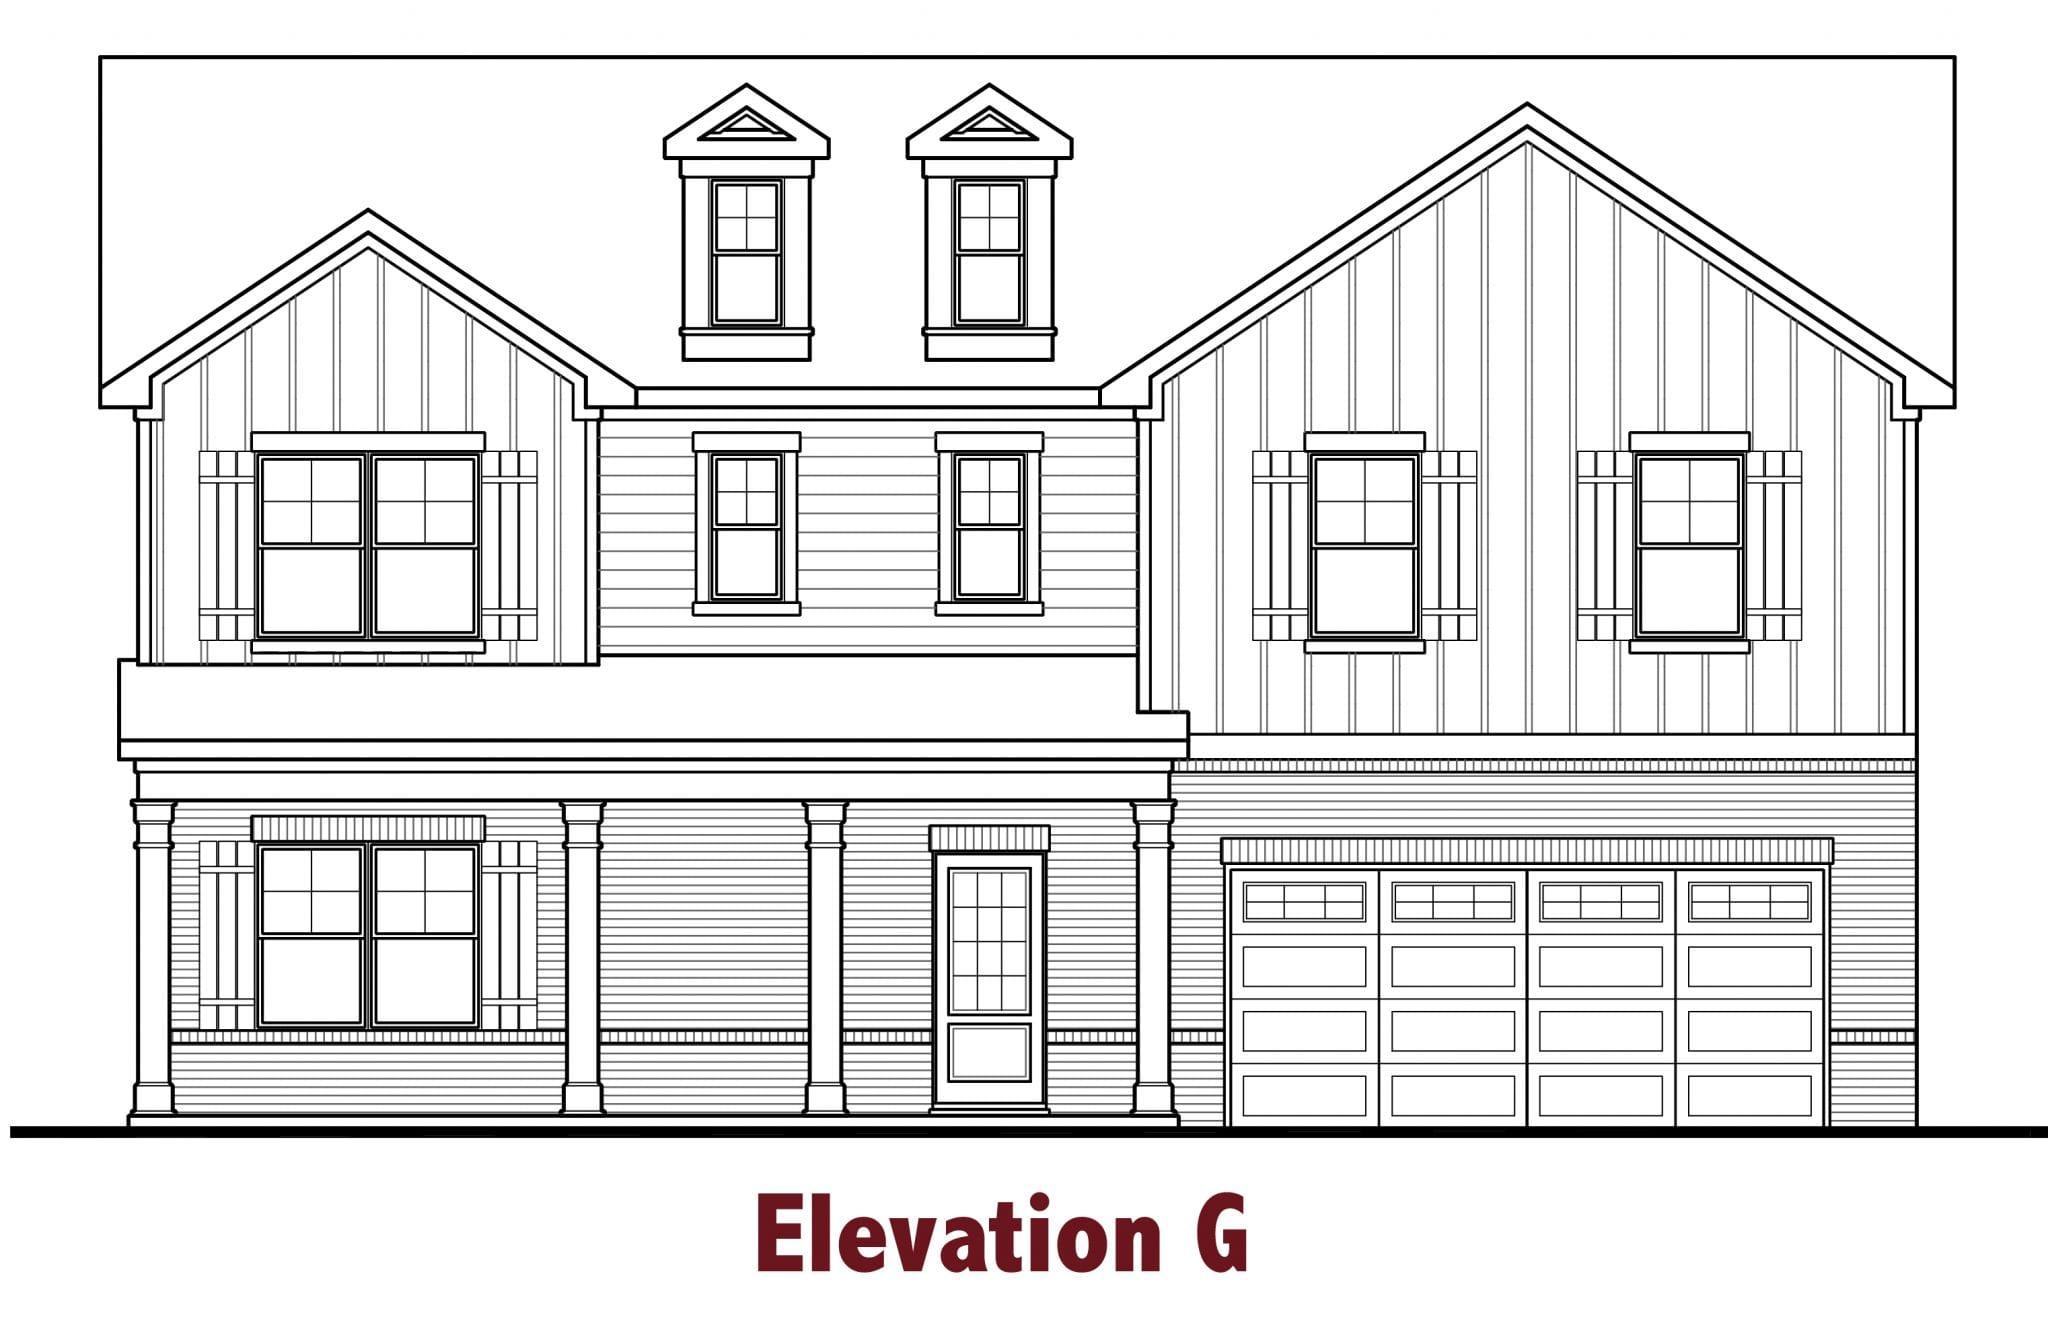 Everett elevations Image